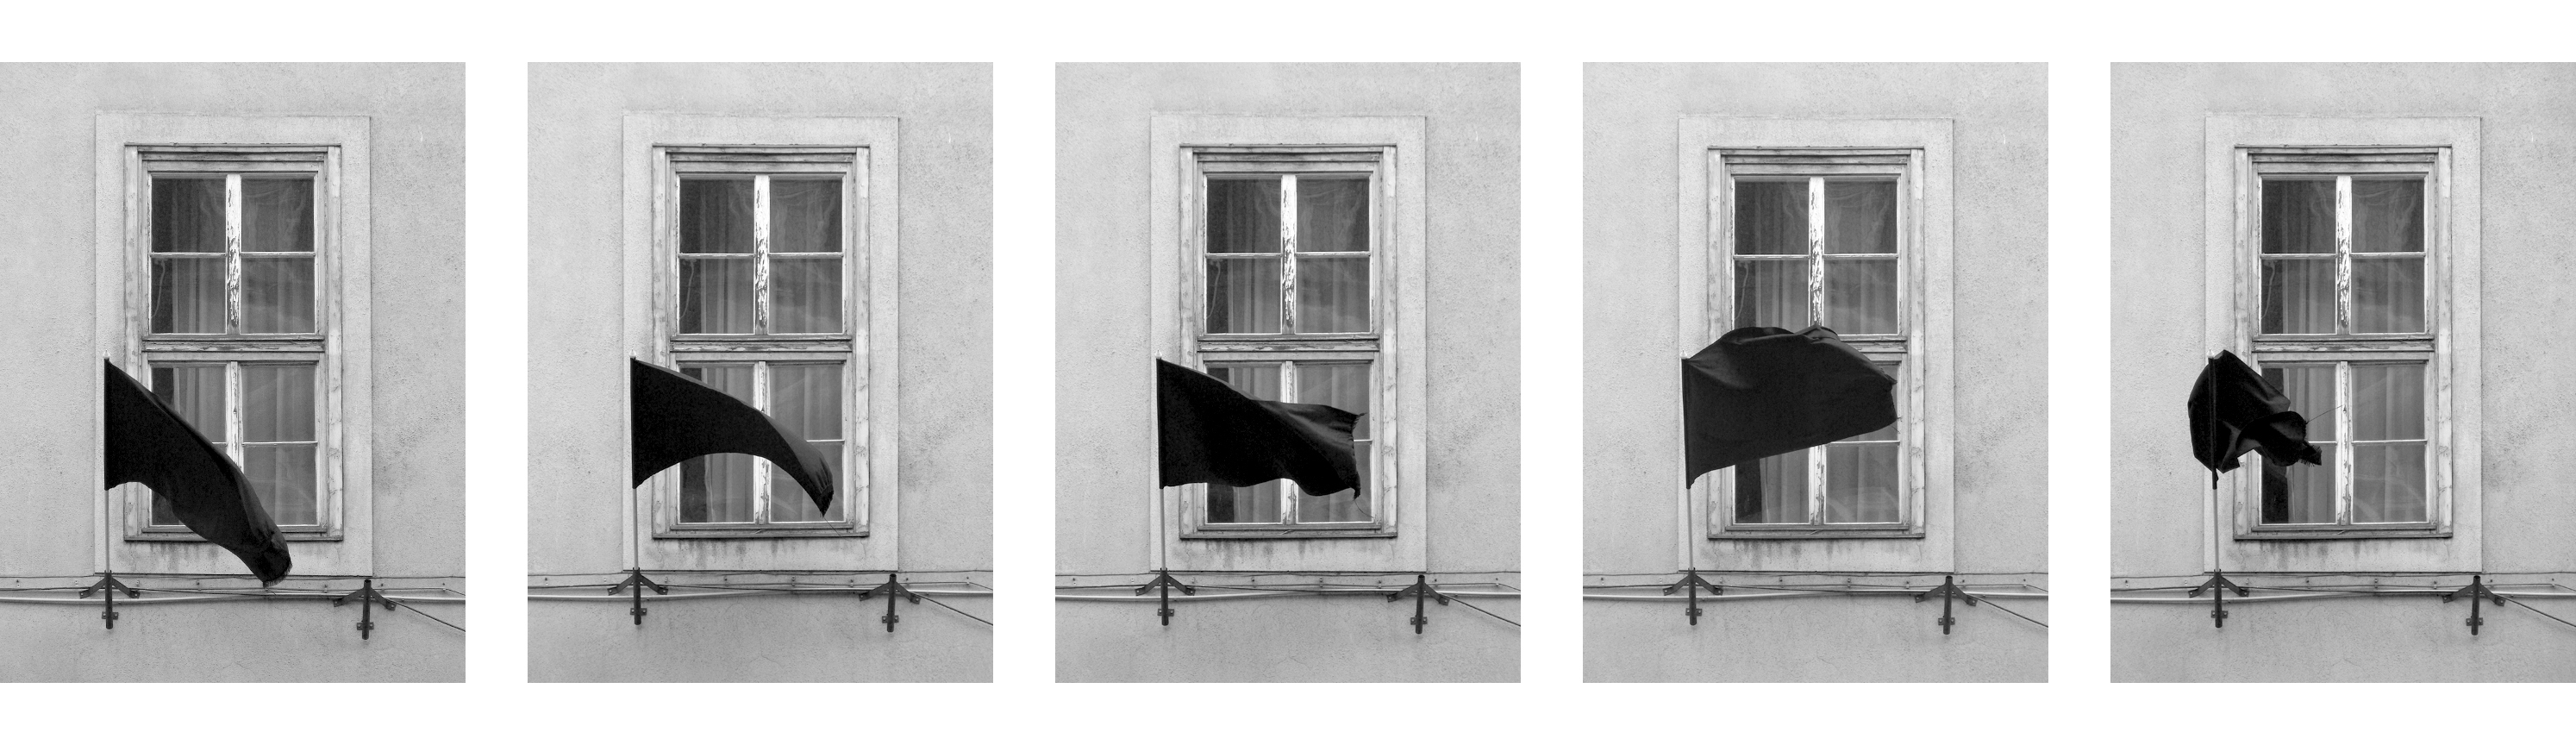 Black Flag_seq_w2.jpg